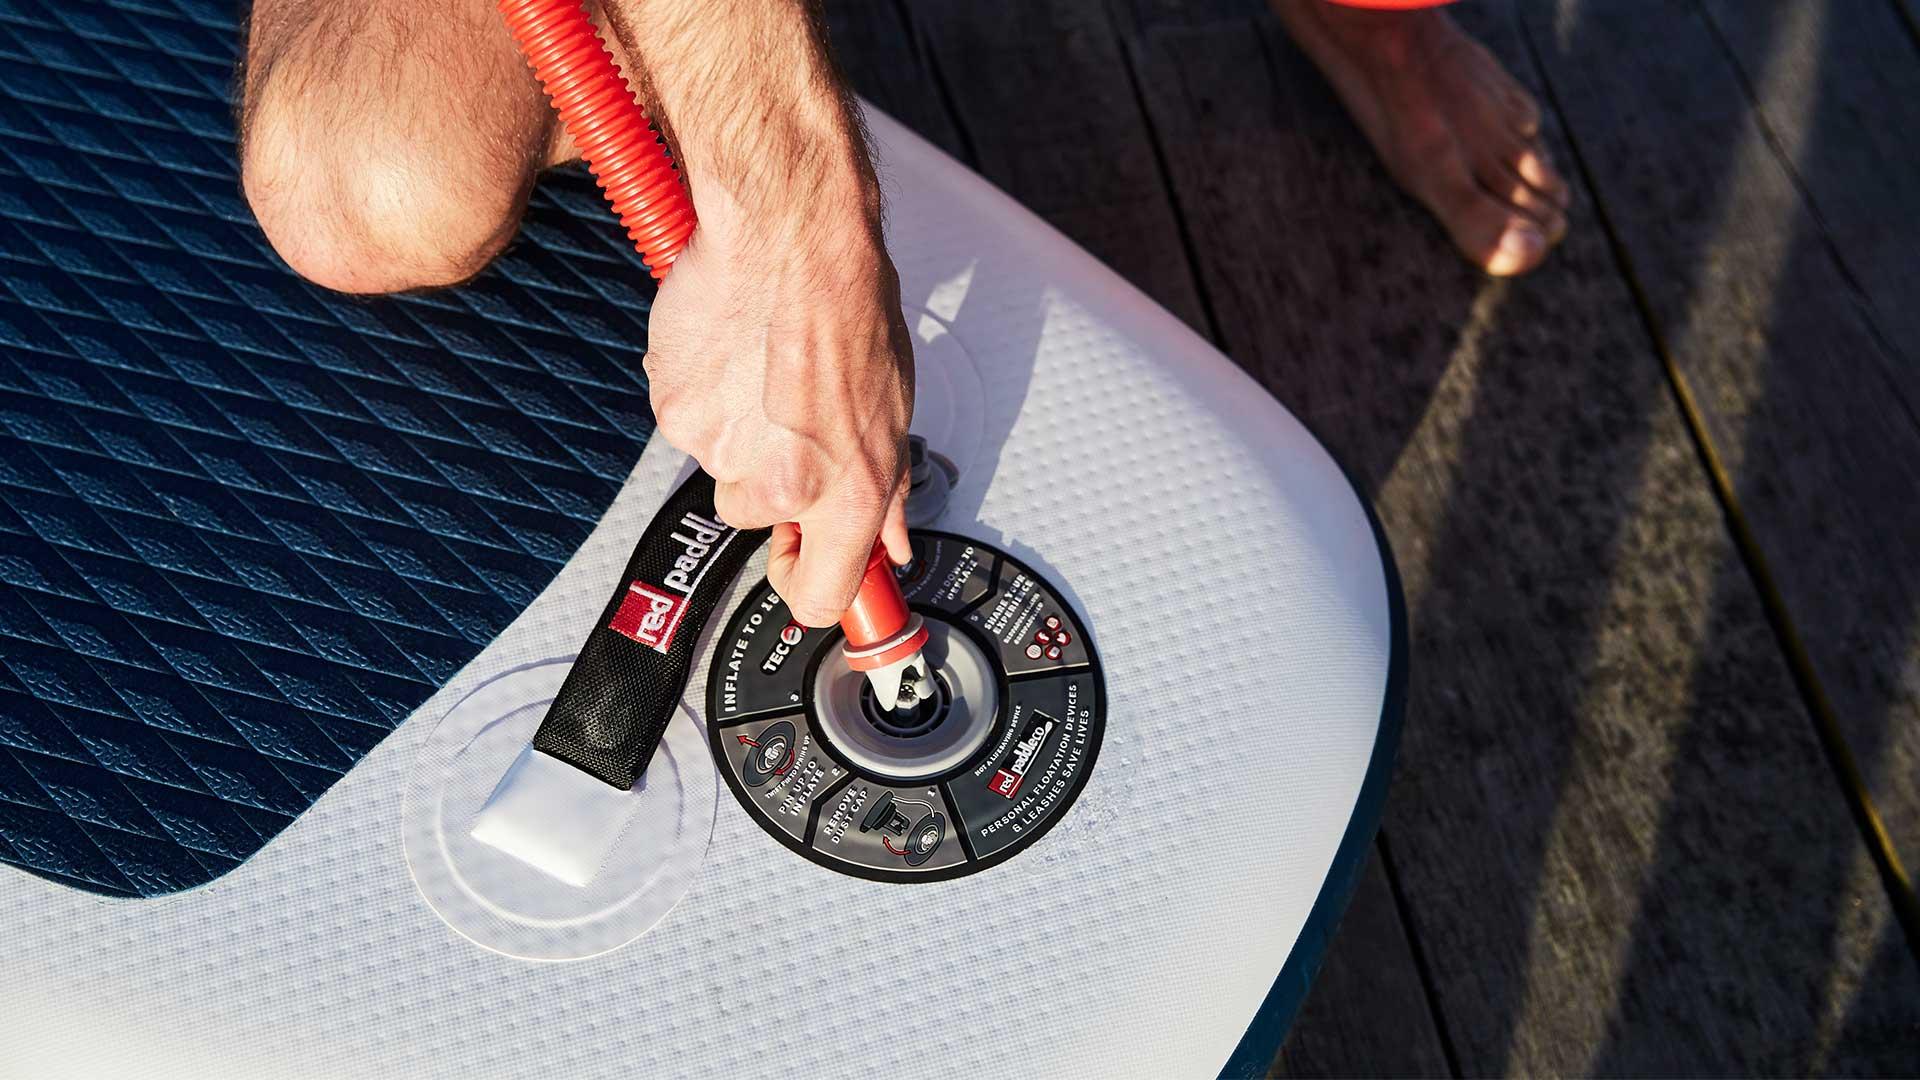 redpaddleco-126-sport-inflatable-paddle-board-desktop-gallery-valve